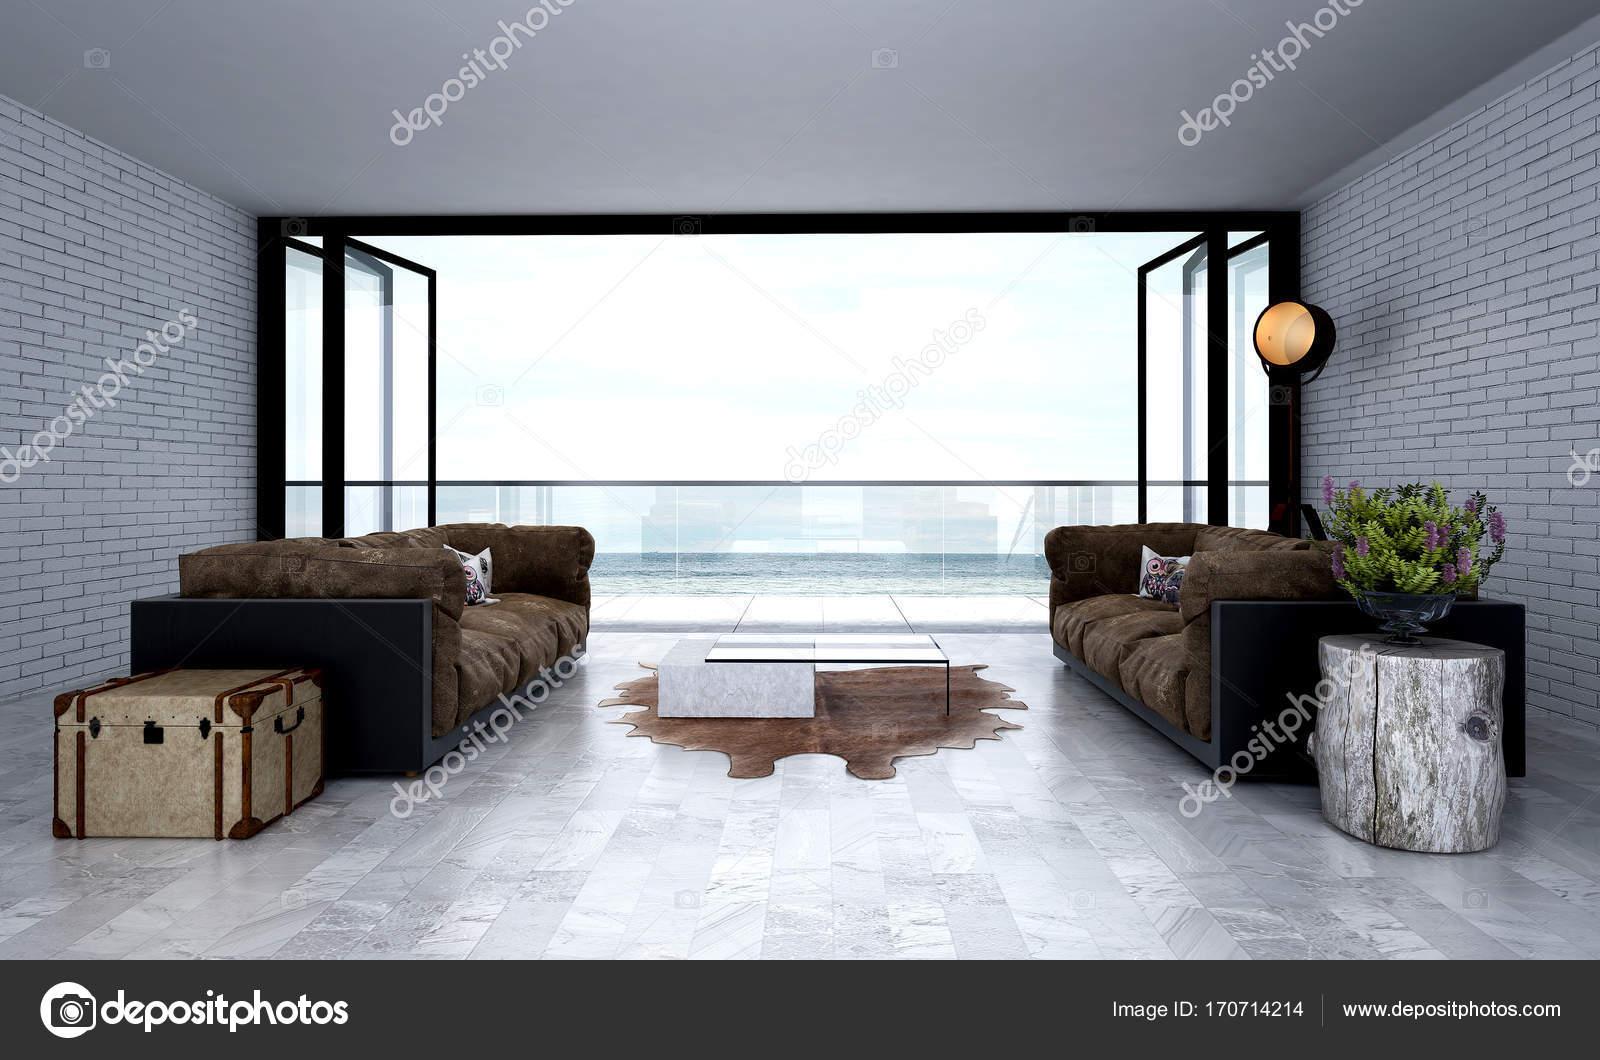 https://st3.depositphotos.com/11732771/17071/i/1600/depositphotos_170714214-stockafbeelding-de-moderne-lounge-en-woonkamer.jpg